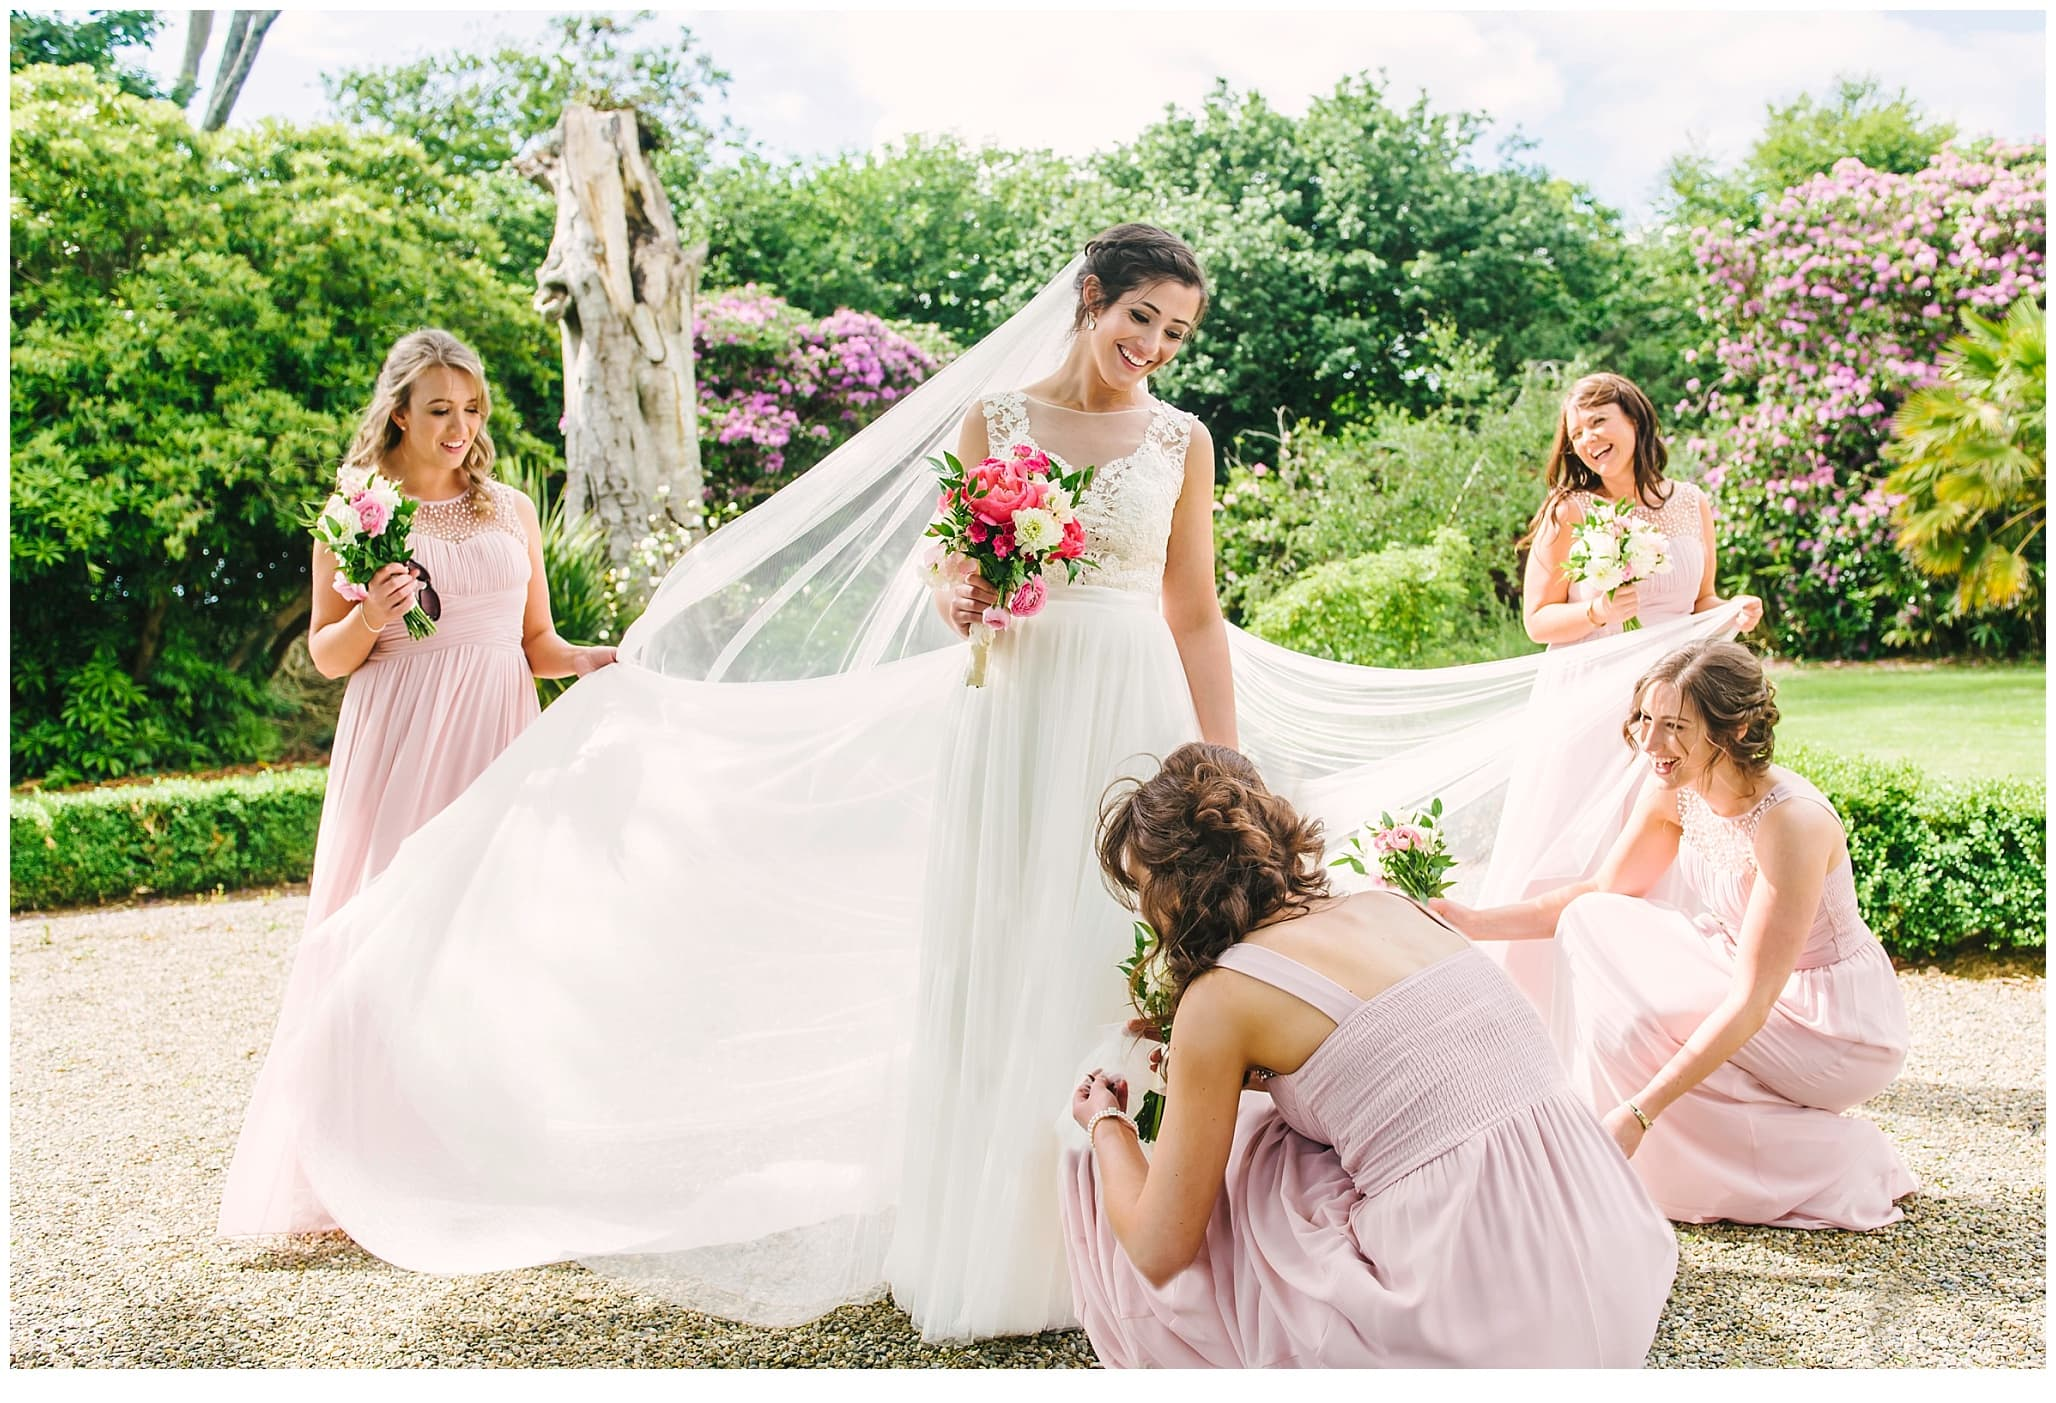 Horetown house wedding photographer